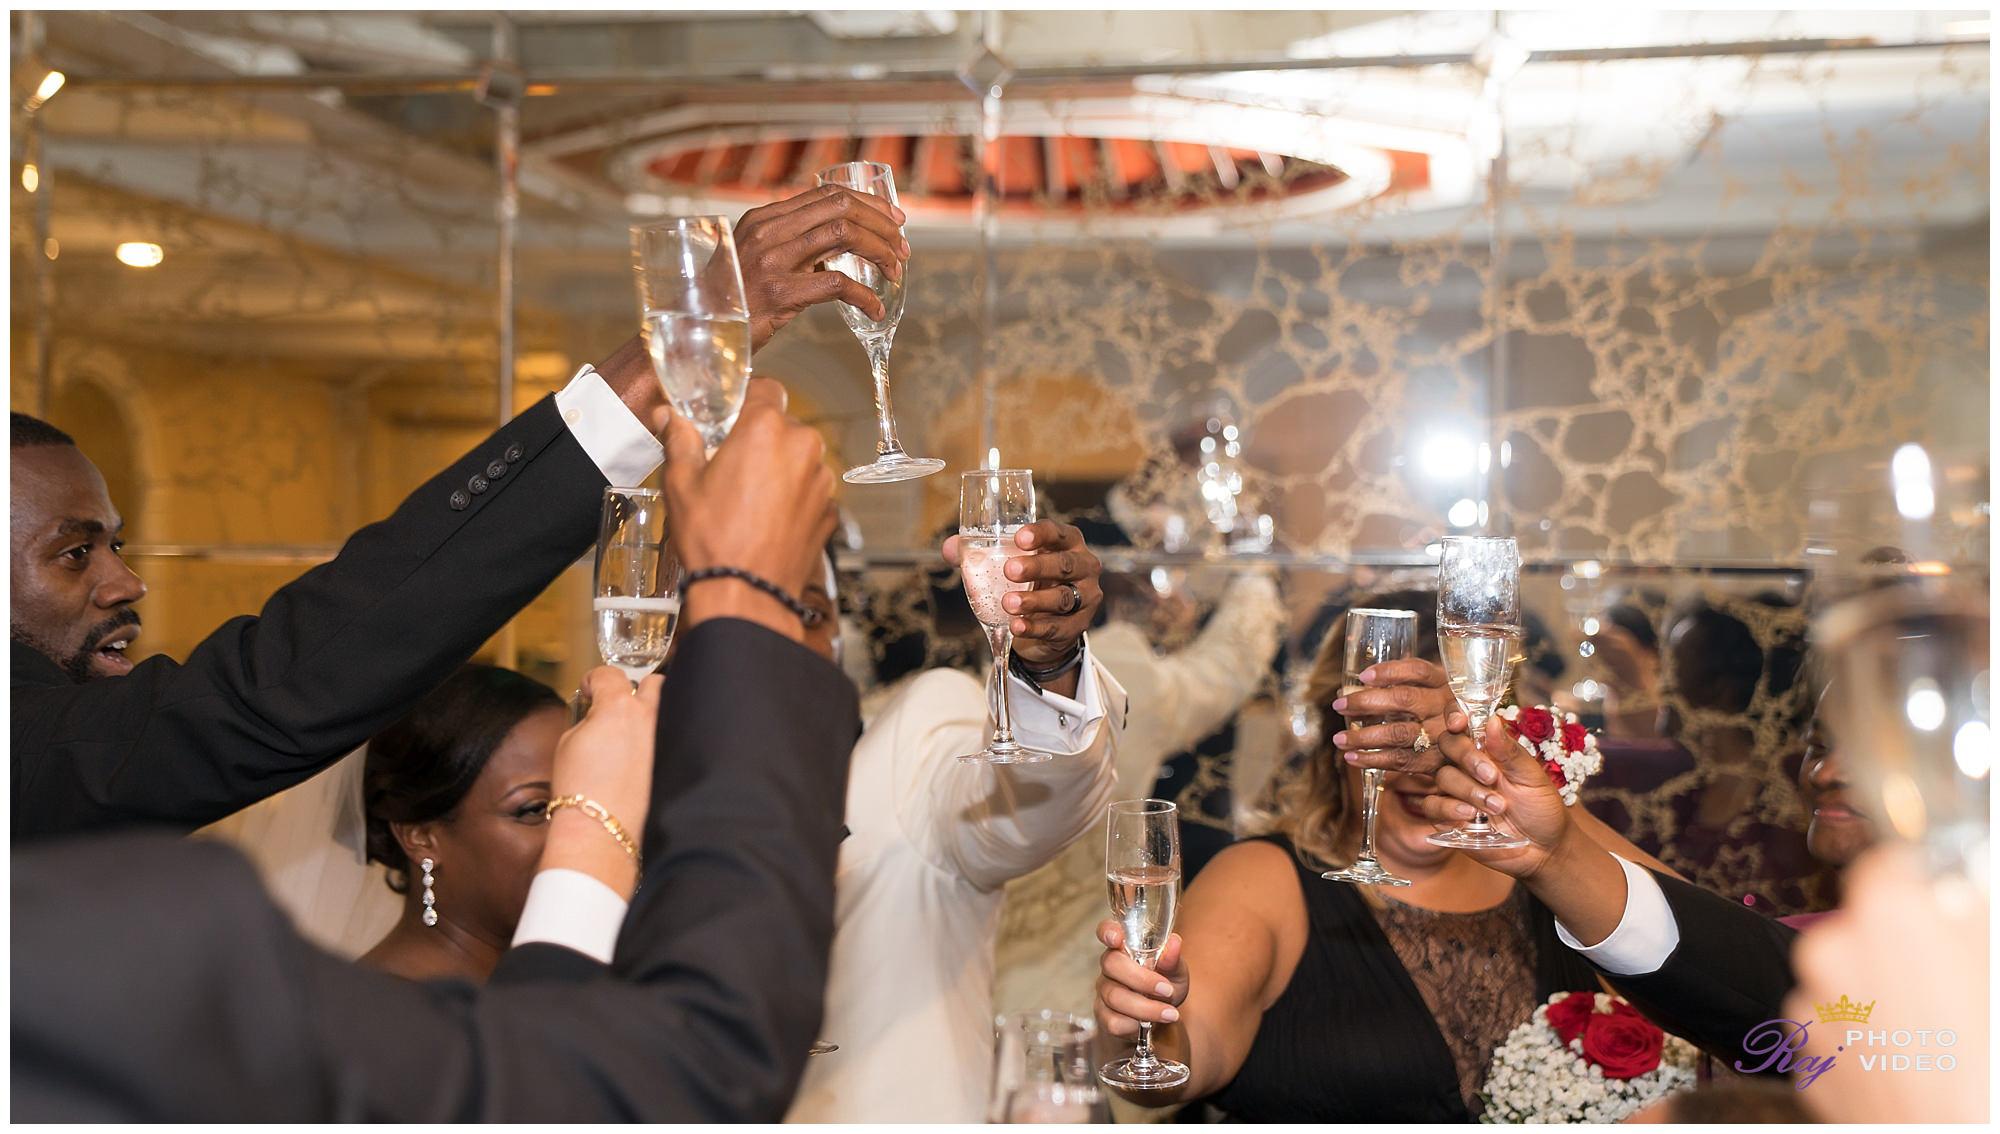 Royal_Manor_Garfield_NJ_Christian_Wedding_Jade_Scott-0012.jpg